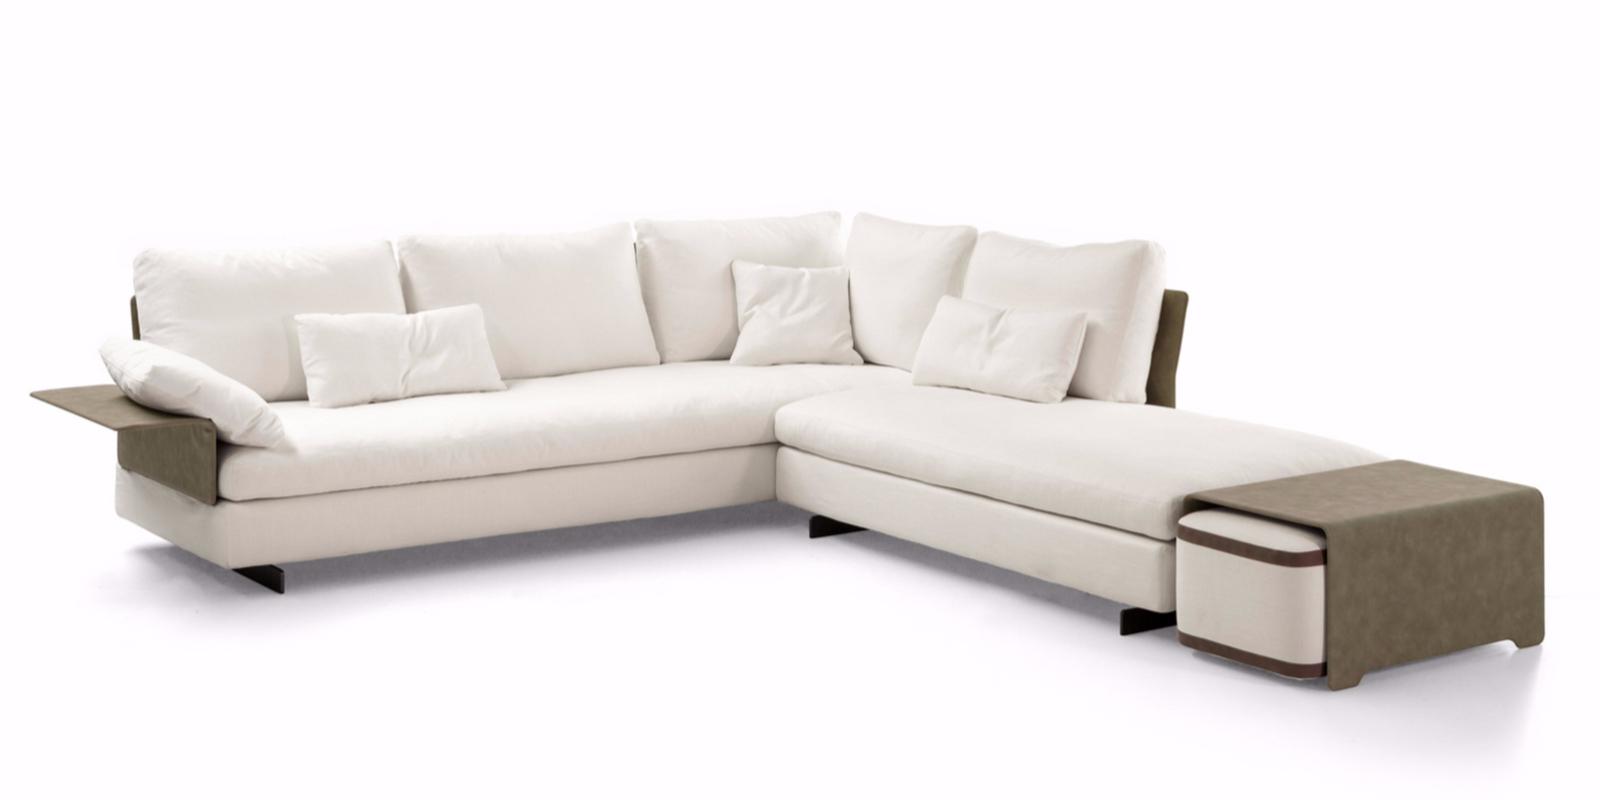 gossip sofa bonaldo 4. Black Bedroom Furniture Sets. Home Design Ideas